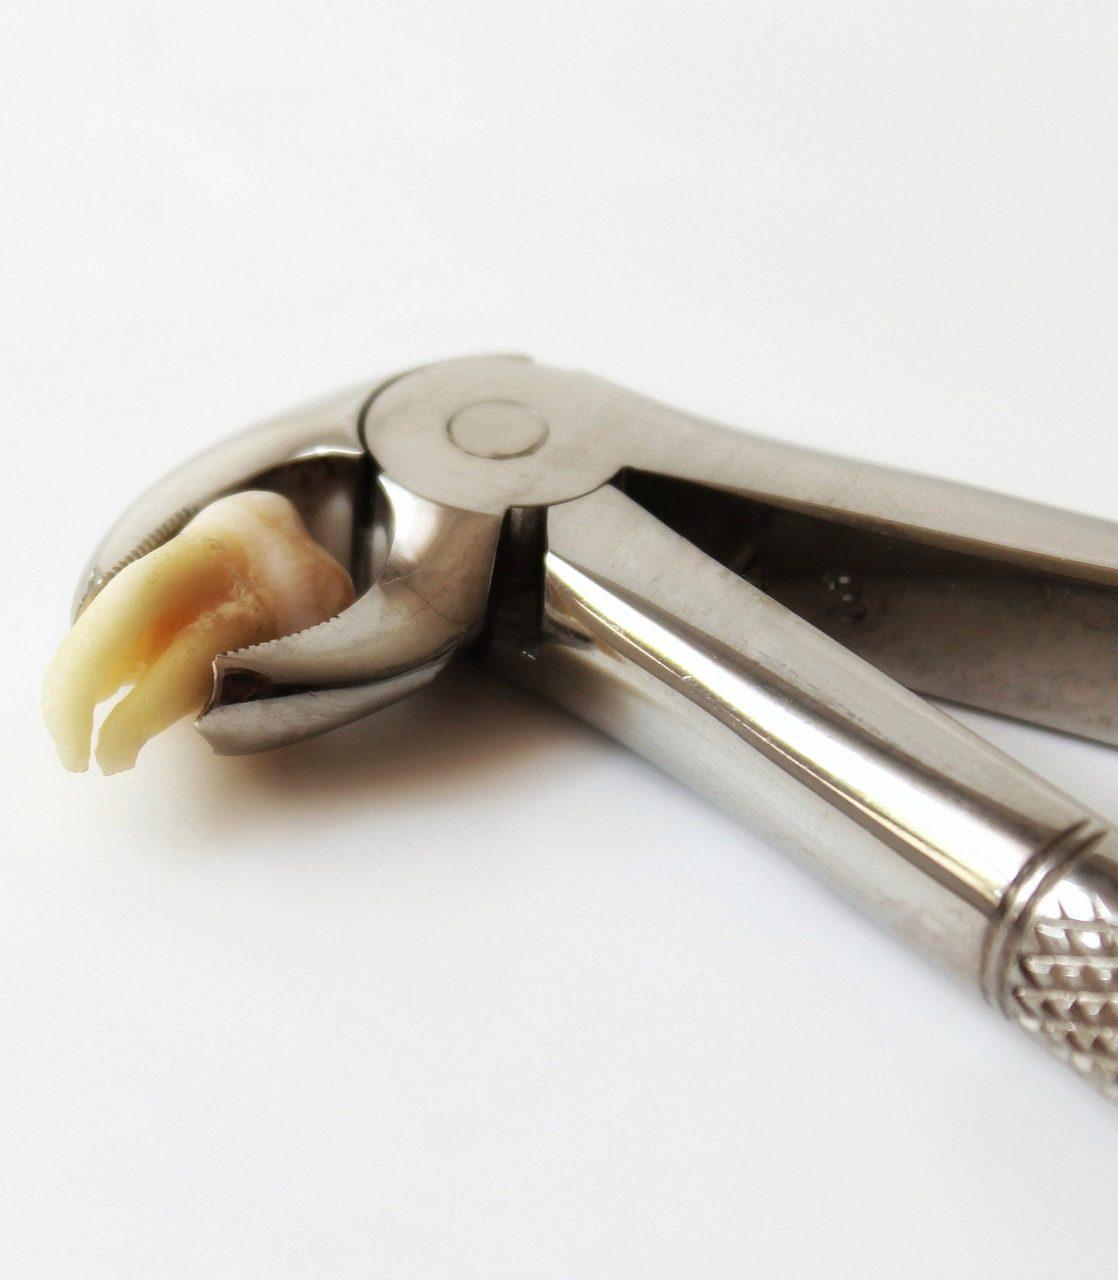 https://lira-clinic.com.ua/wp-content/uploads/2018/07/tooth-3492645_1920-e1534918858701.jpg?id=5804